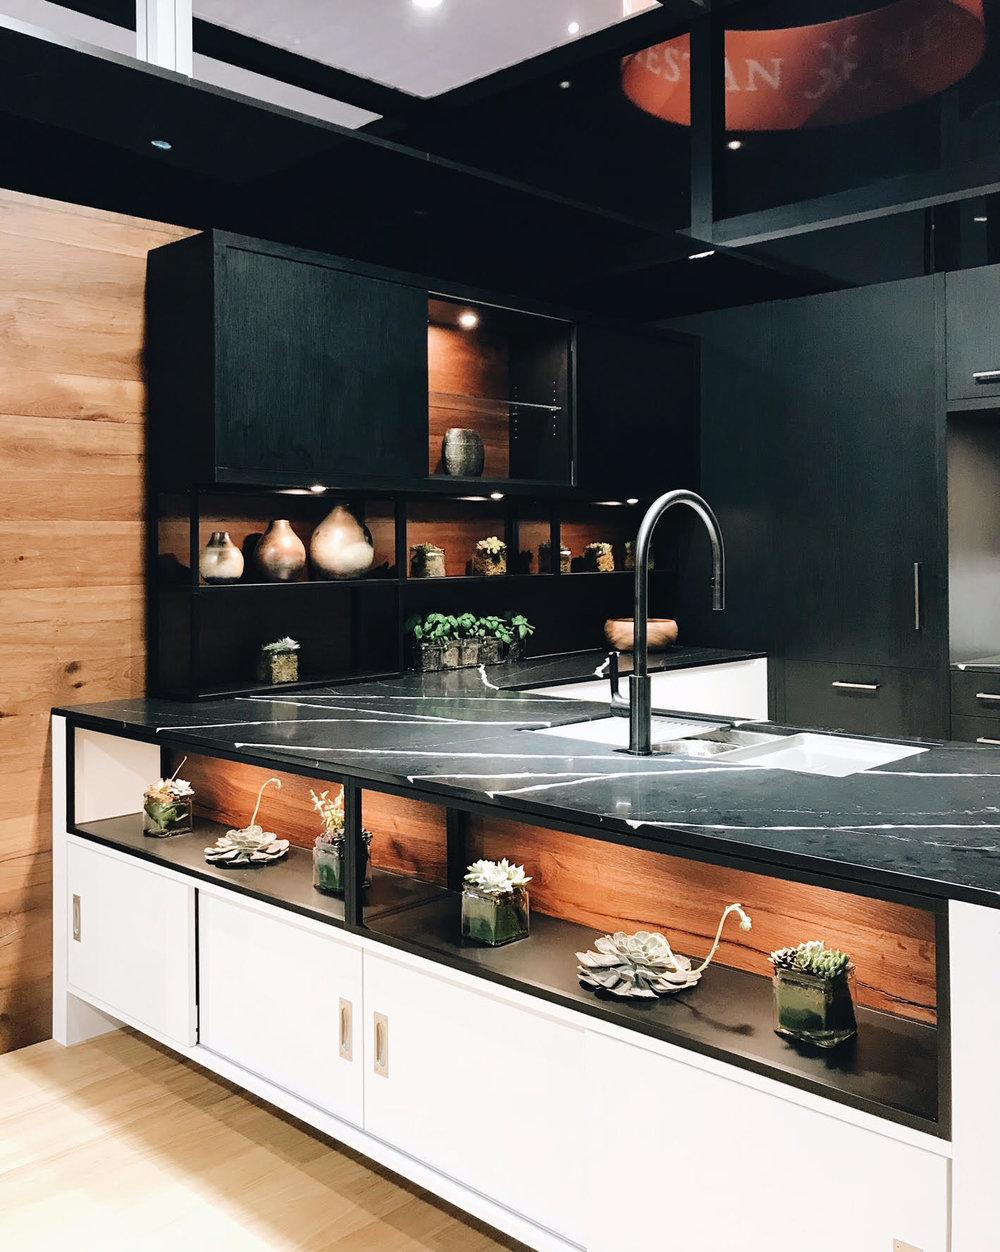 Harmoni, Open Shelves, Kitchen Trends, BlogTourKBIS, Modenus, KBIS 2018, Nyla Free Designs, Calgary Interior Designer